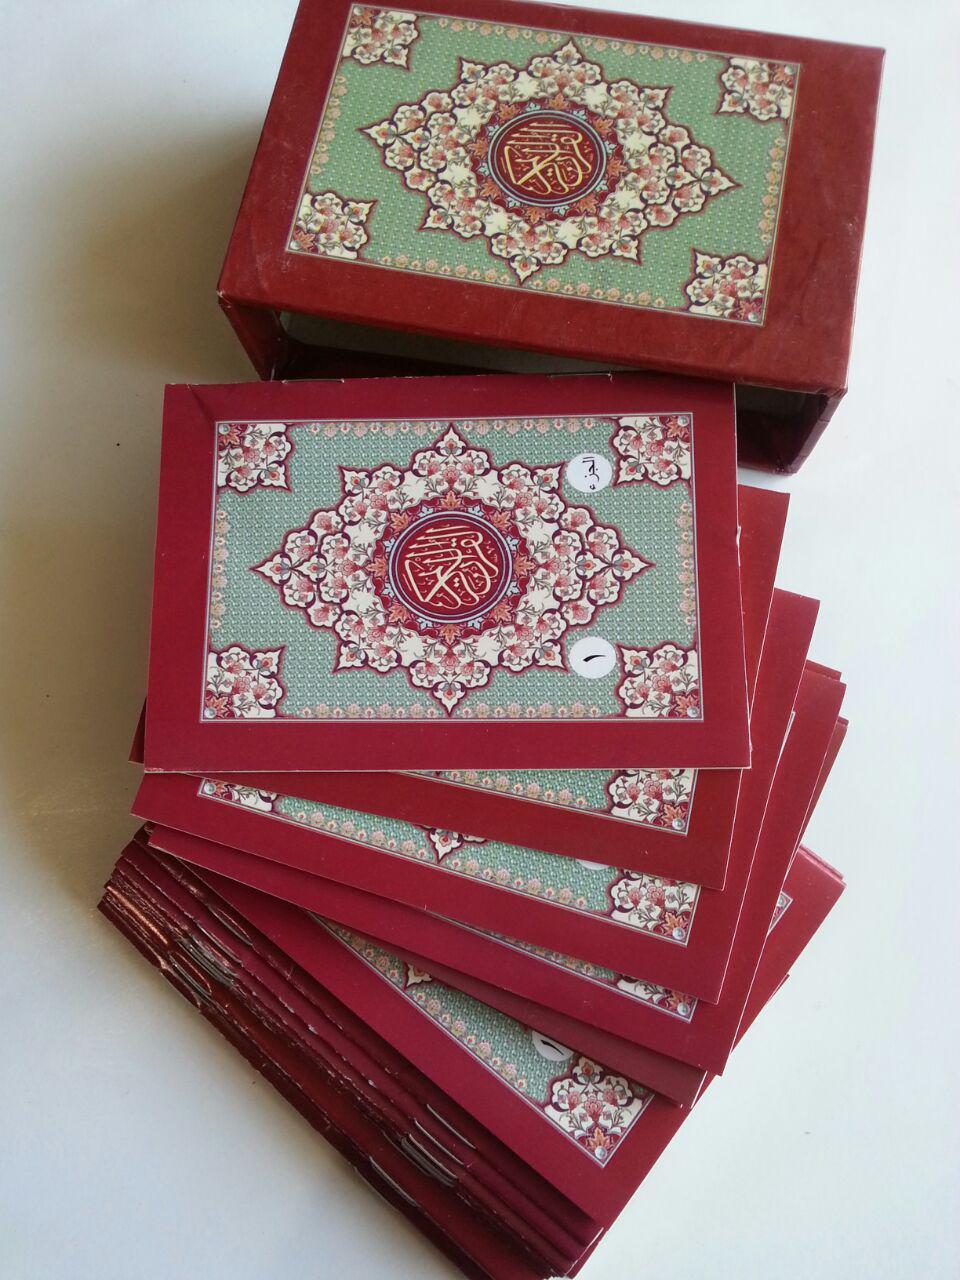 Al-Qur'an Impor Per Juz Tanpa Terjemah Ukuran 8x12 cover